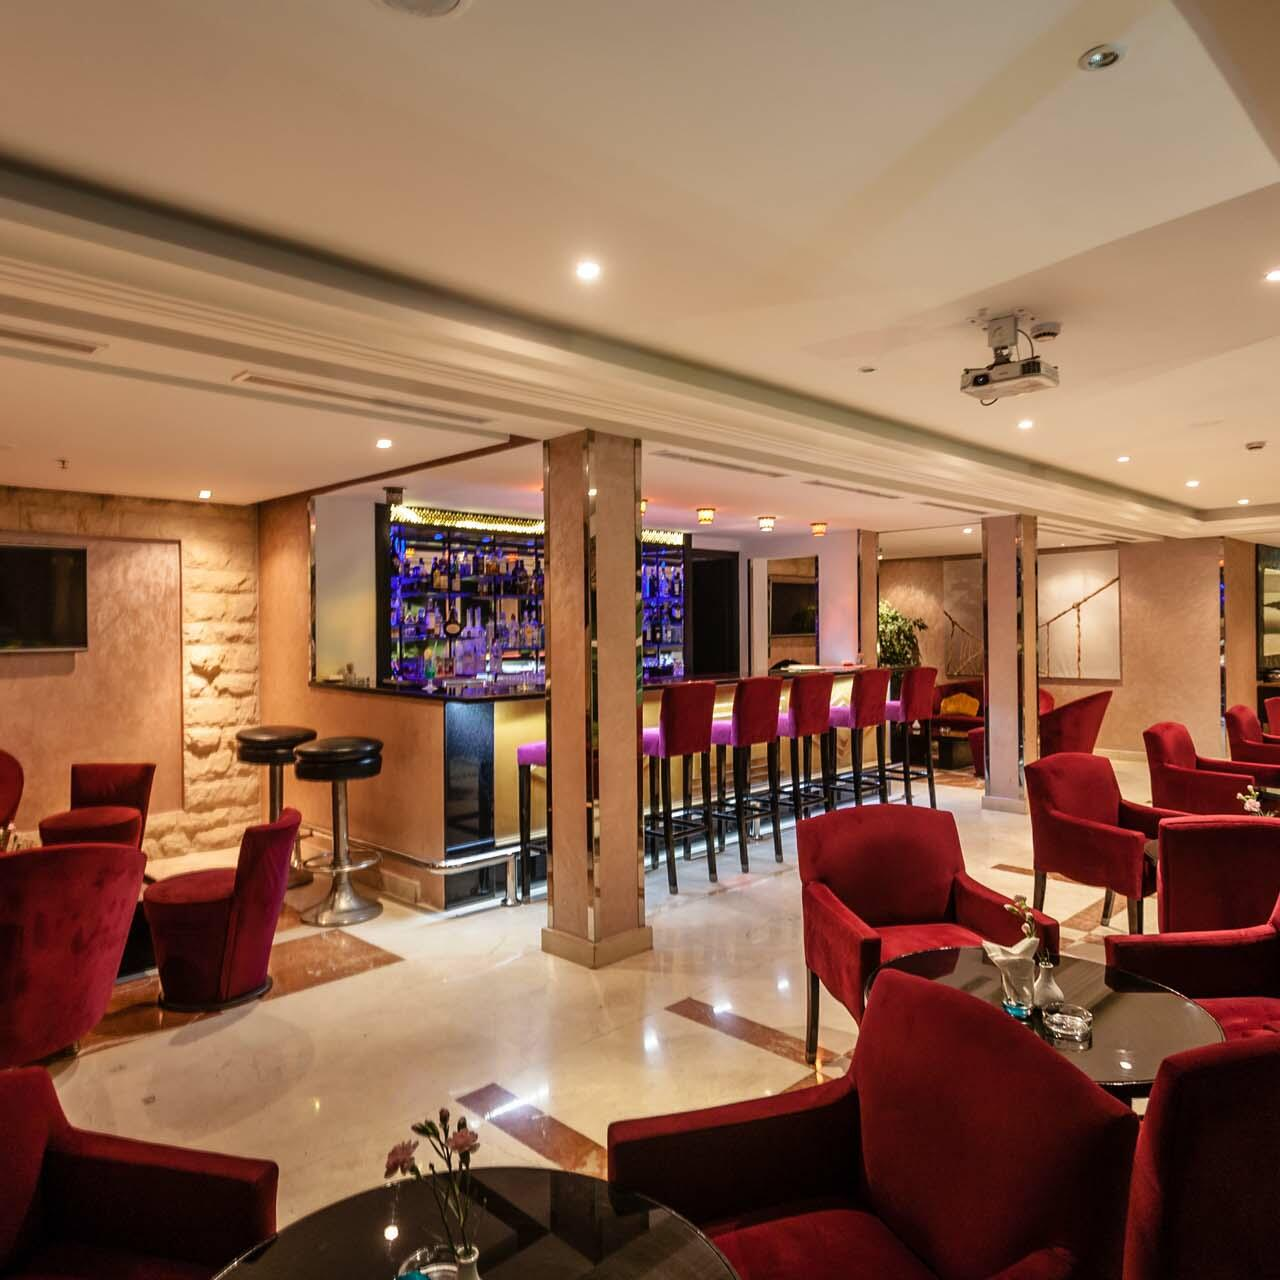 Comfortable Chairs - Farah Rabat Hotel